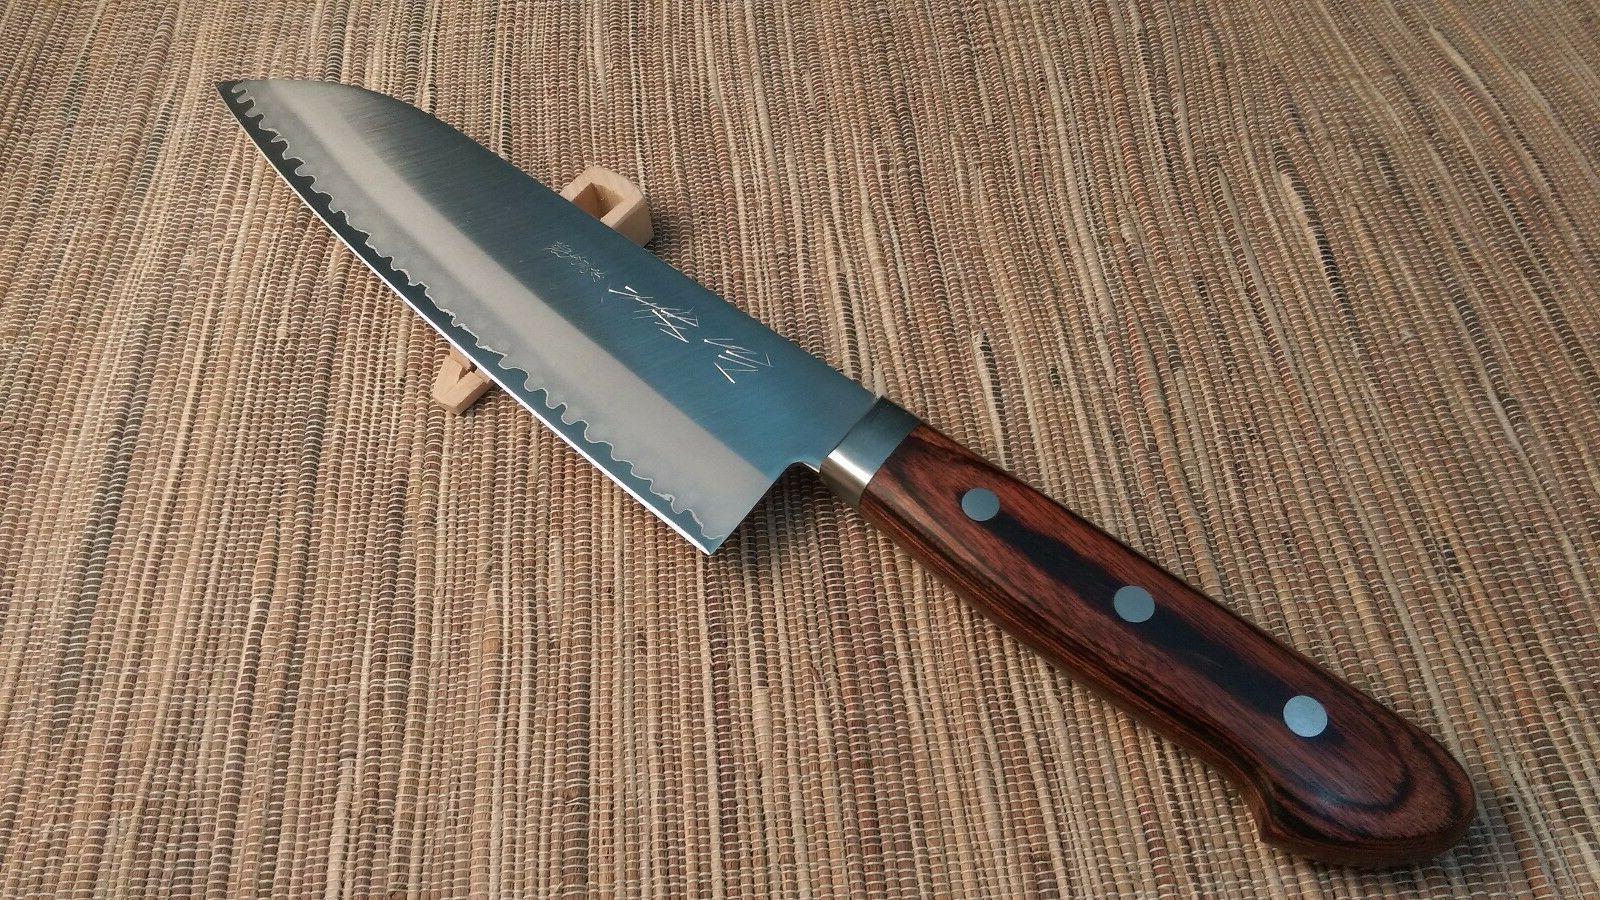 Sakai Japanese Kitchen Yoshihiro Santoku knife